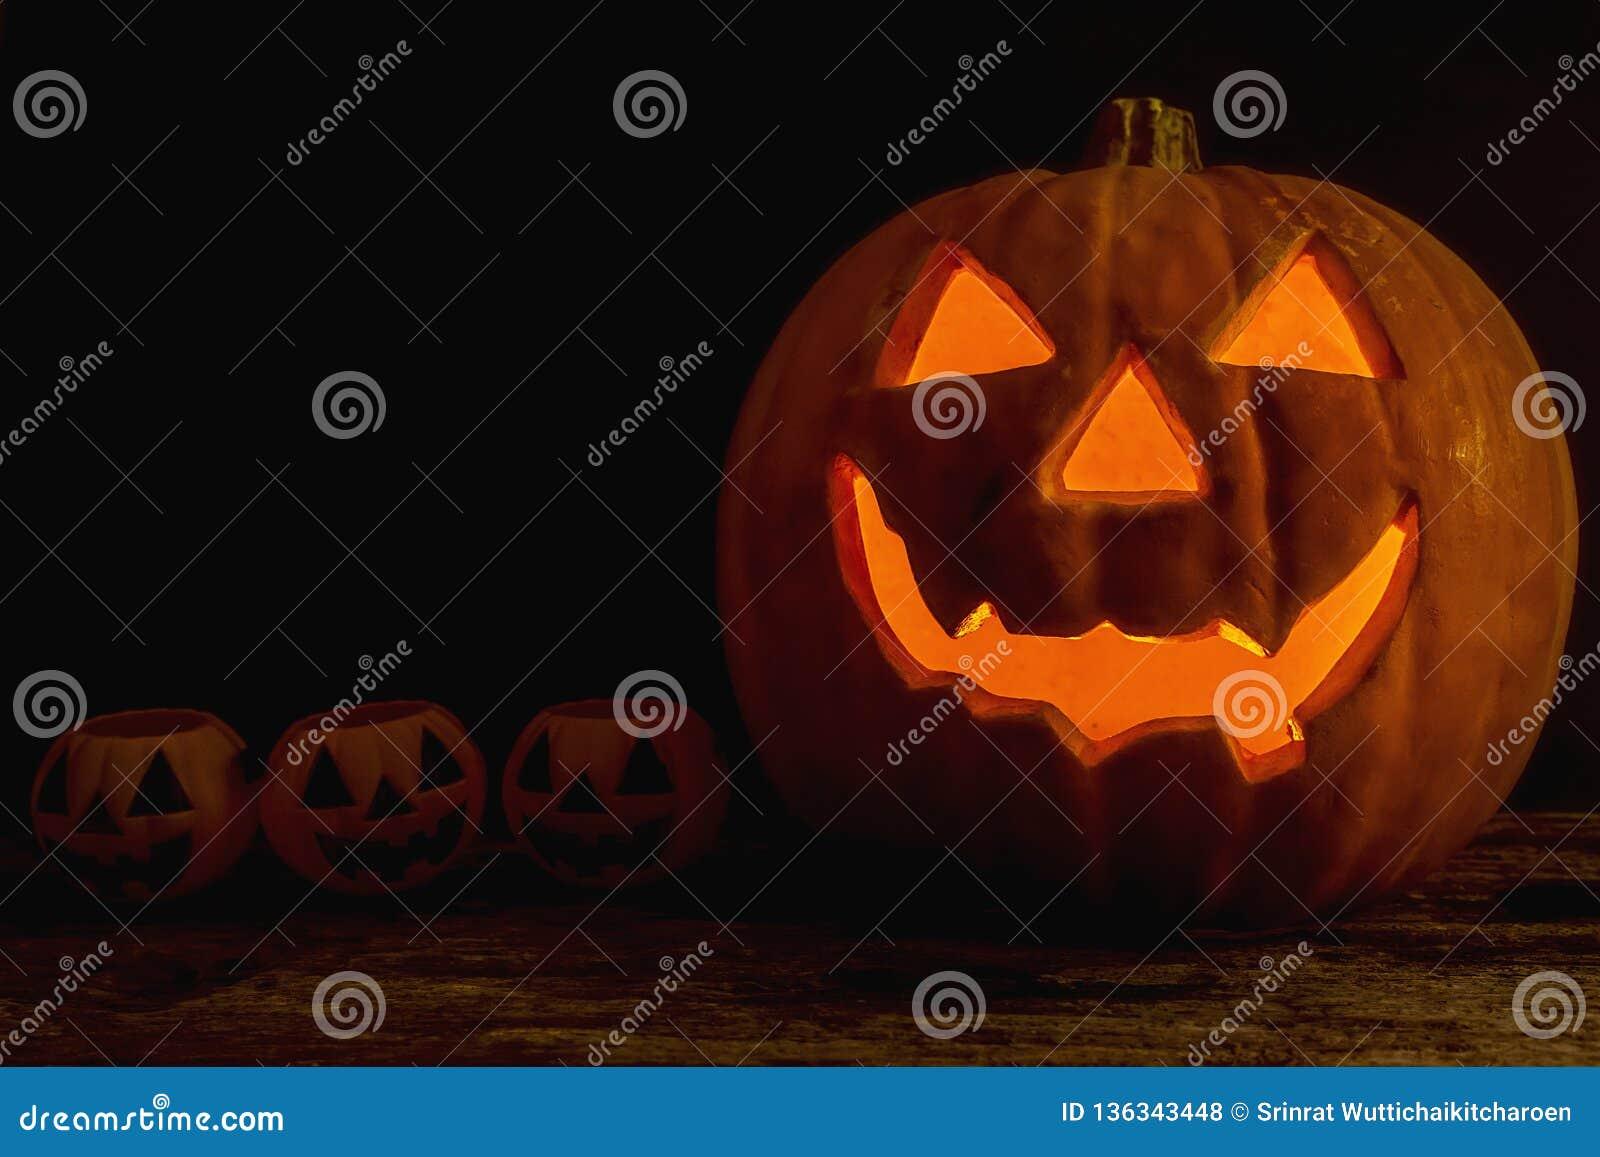 Halloween Pumpkin Heads Jack O Lantern Stock Photo - Image